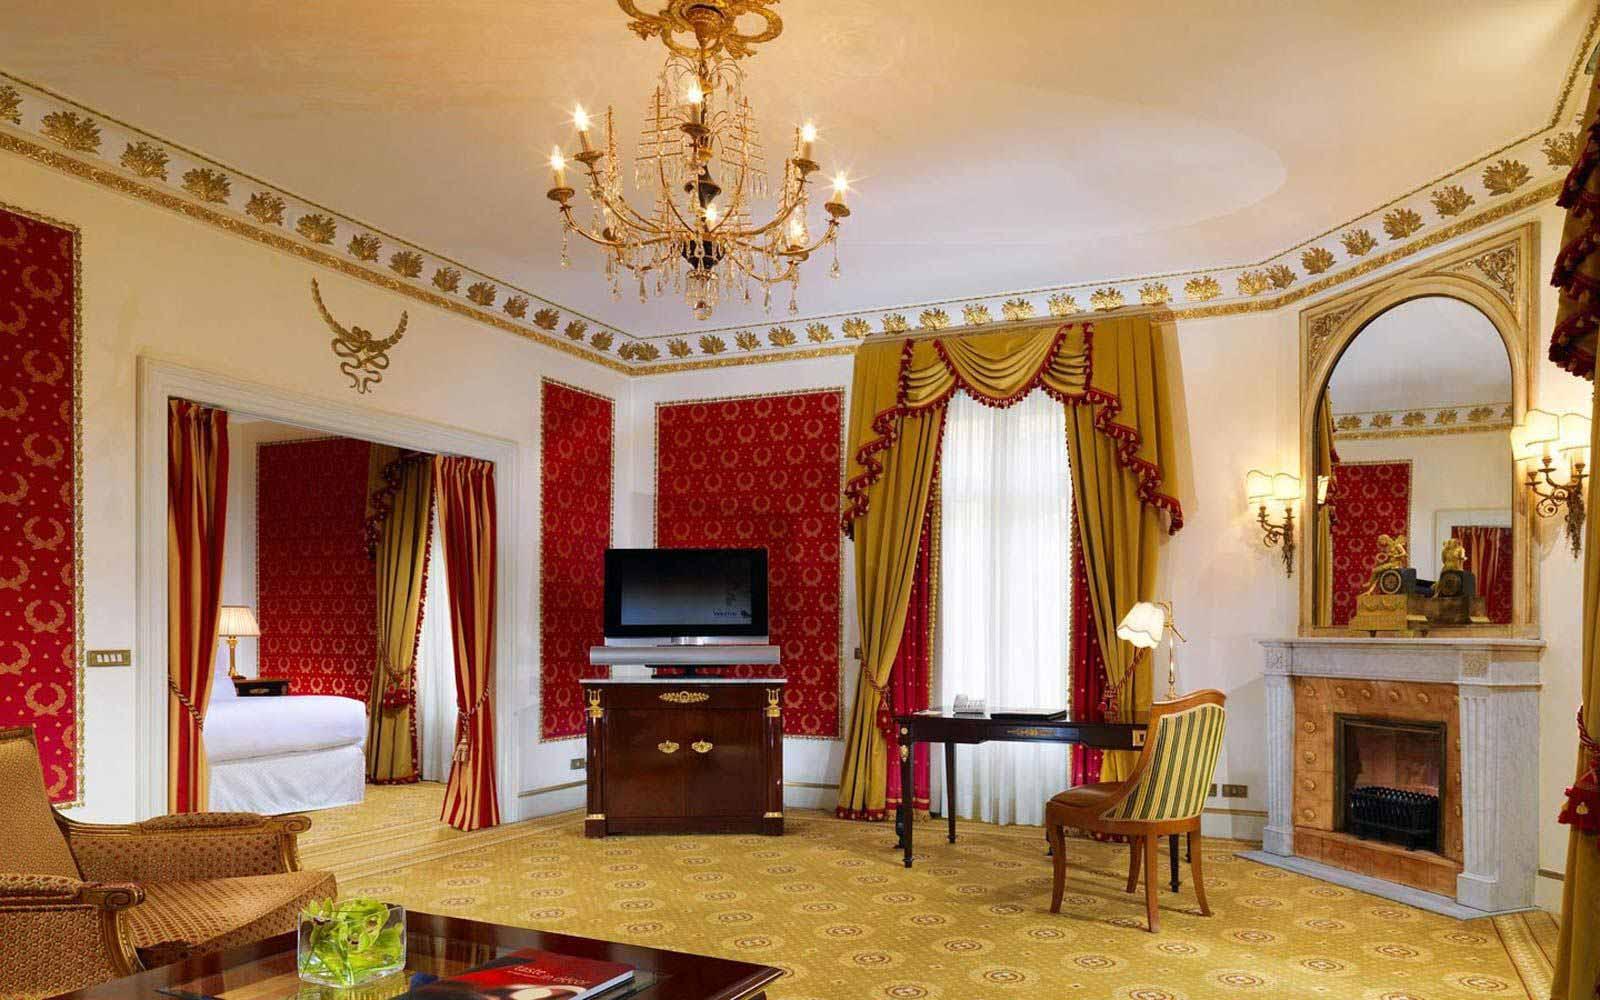 Junior suite at The Westin Excelsior